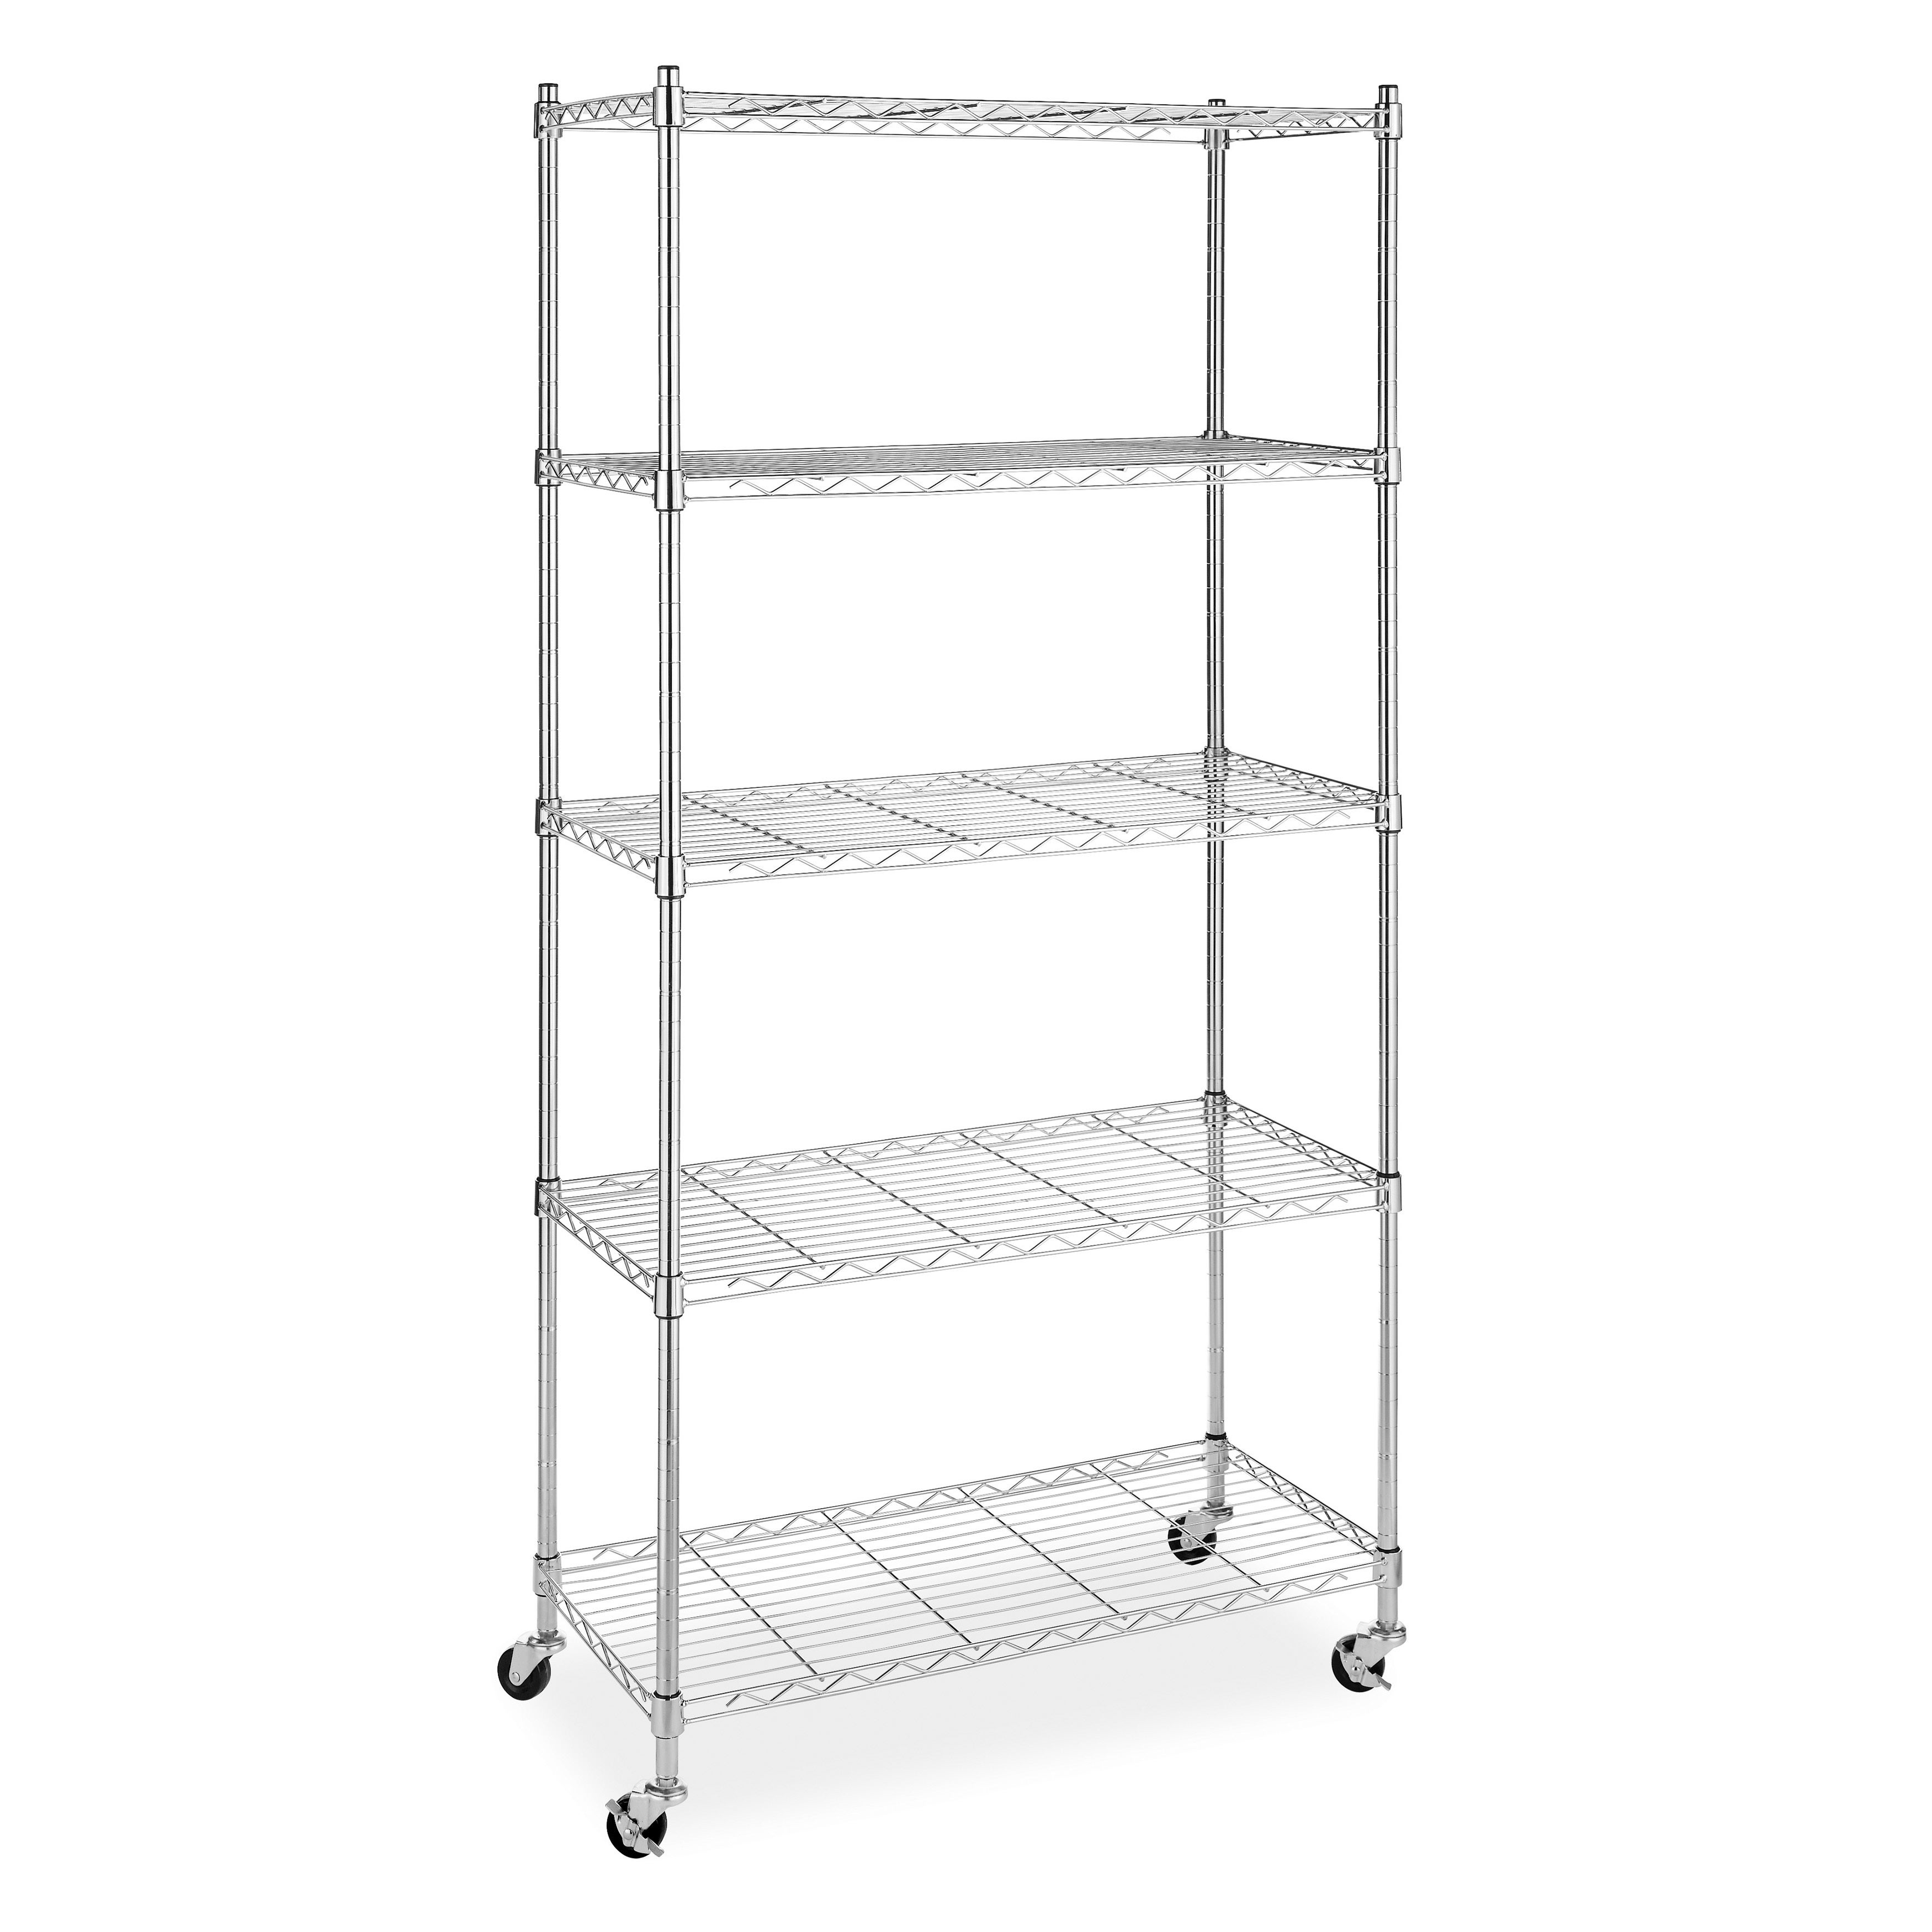 Whitmor Mfg Co 5-tier Storage Rack, Silver